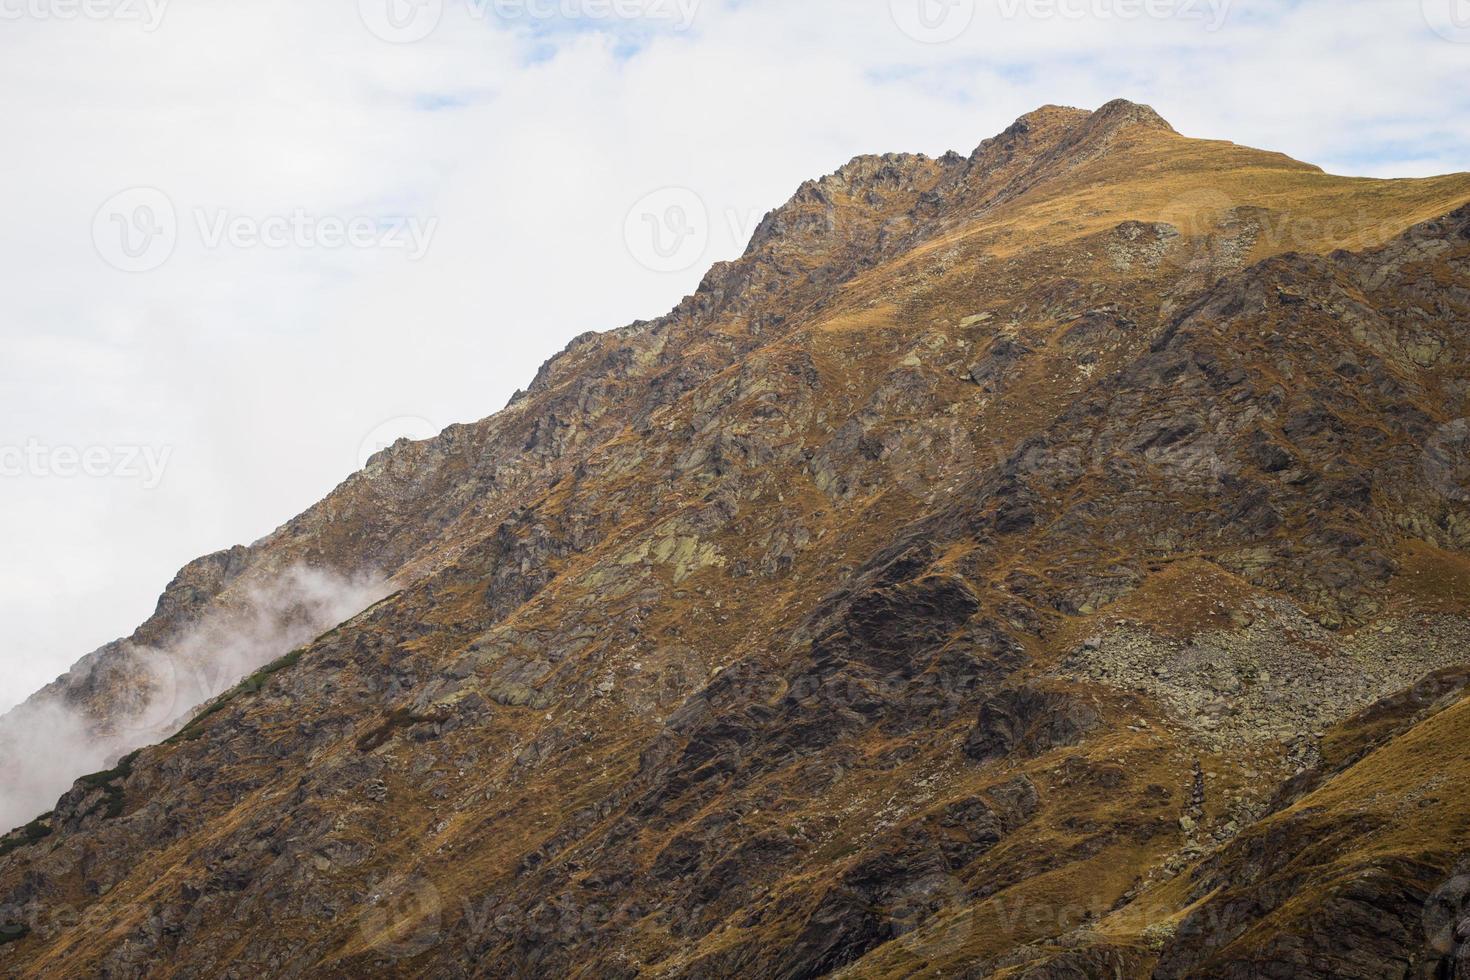 Carpathian mountains along the Transfagarasan highway photo